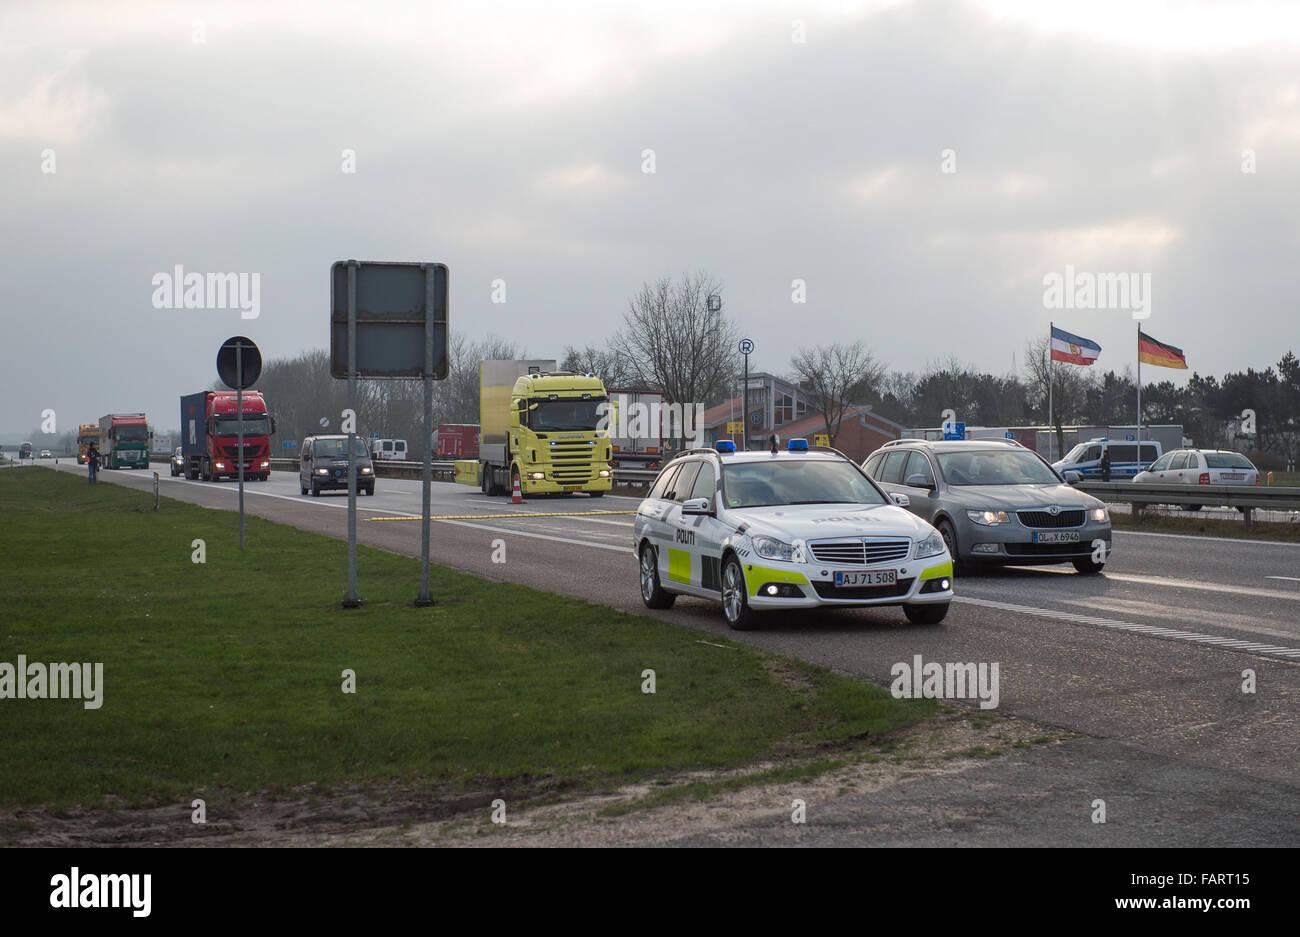 mature escorts flensborg togstation